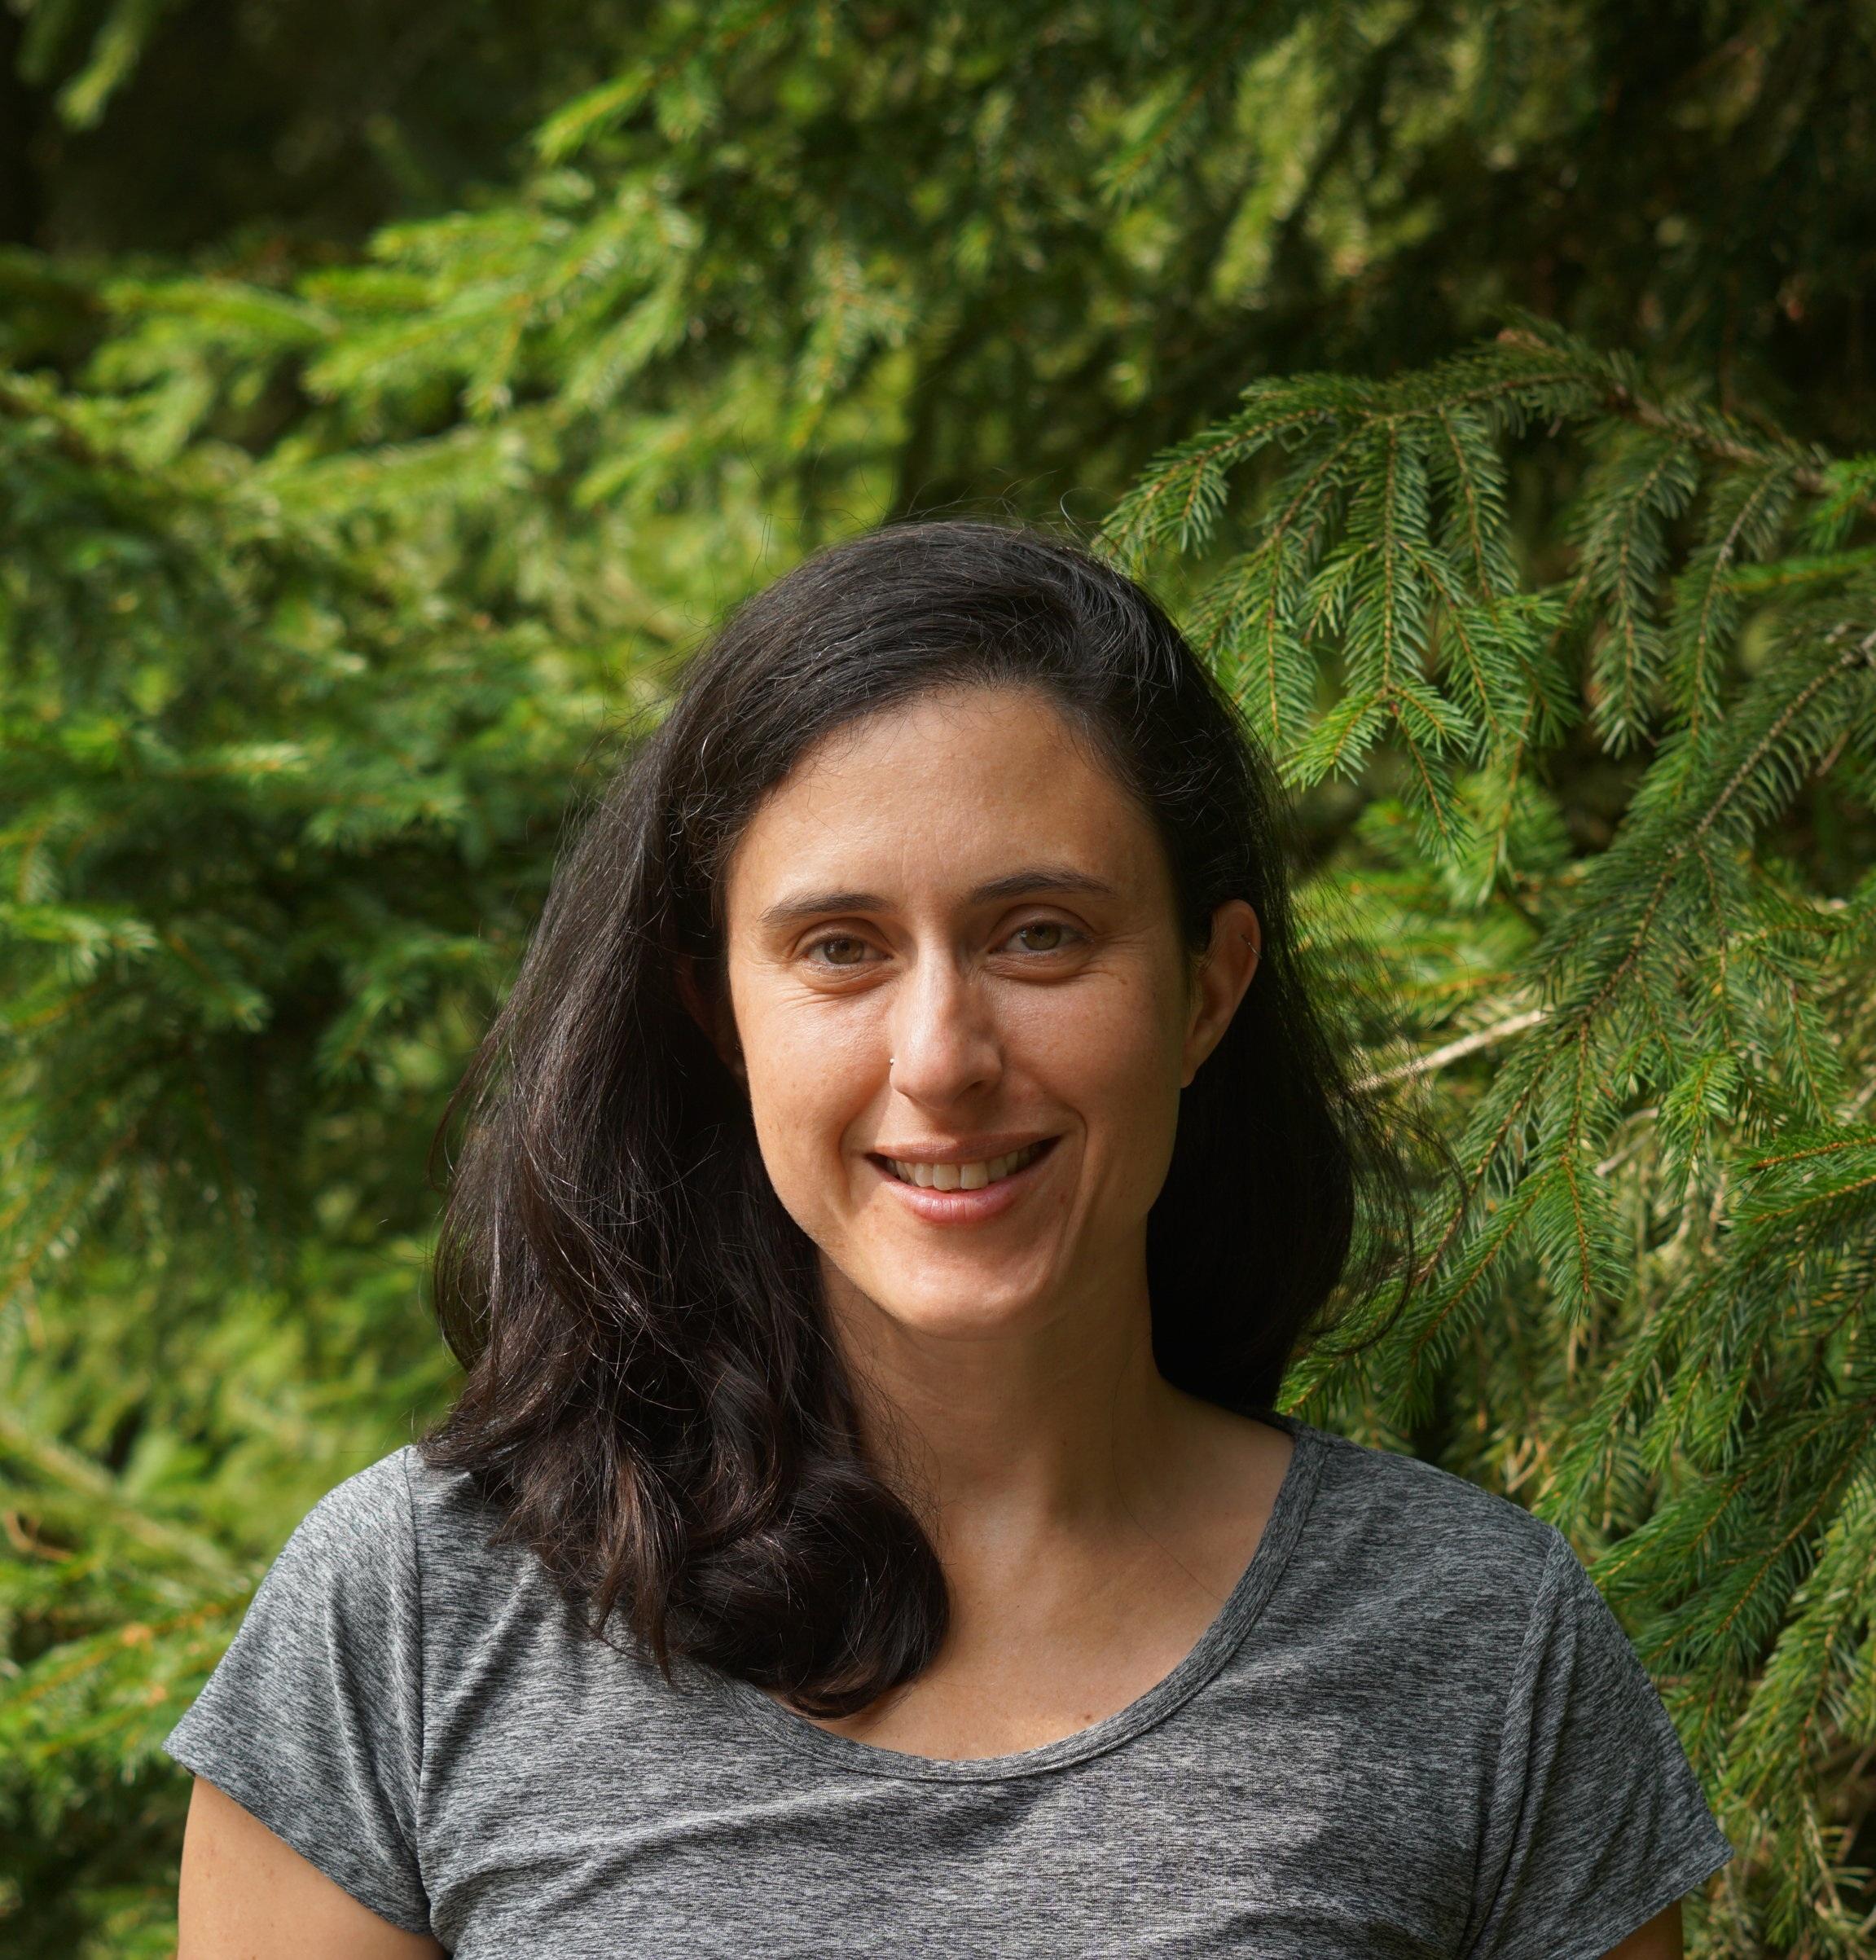 Rachel E. Schattman, Ph.D. - Research Fellow, USDA Northeast Climate Hub, USDA Forest Service (NRS06)Affiliate, University of Vermont Extension Vegetable and Berry ProgramOffice:USDA Forest Service, Aiken Center 208DCarrigan Drive, UVMBurlington, Vermont 05405802-656-1710 (office)website: rschattman.netUSDA email: rachel.e.schattman [at] usda.govUVM email: rschattm [at] uvm.edu